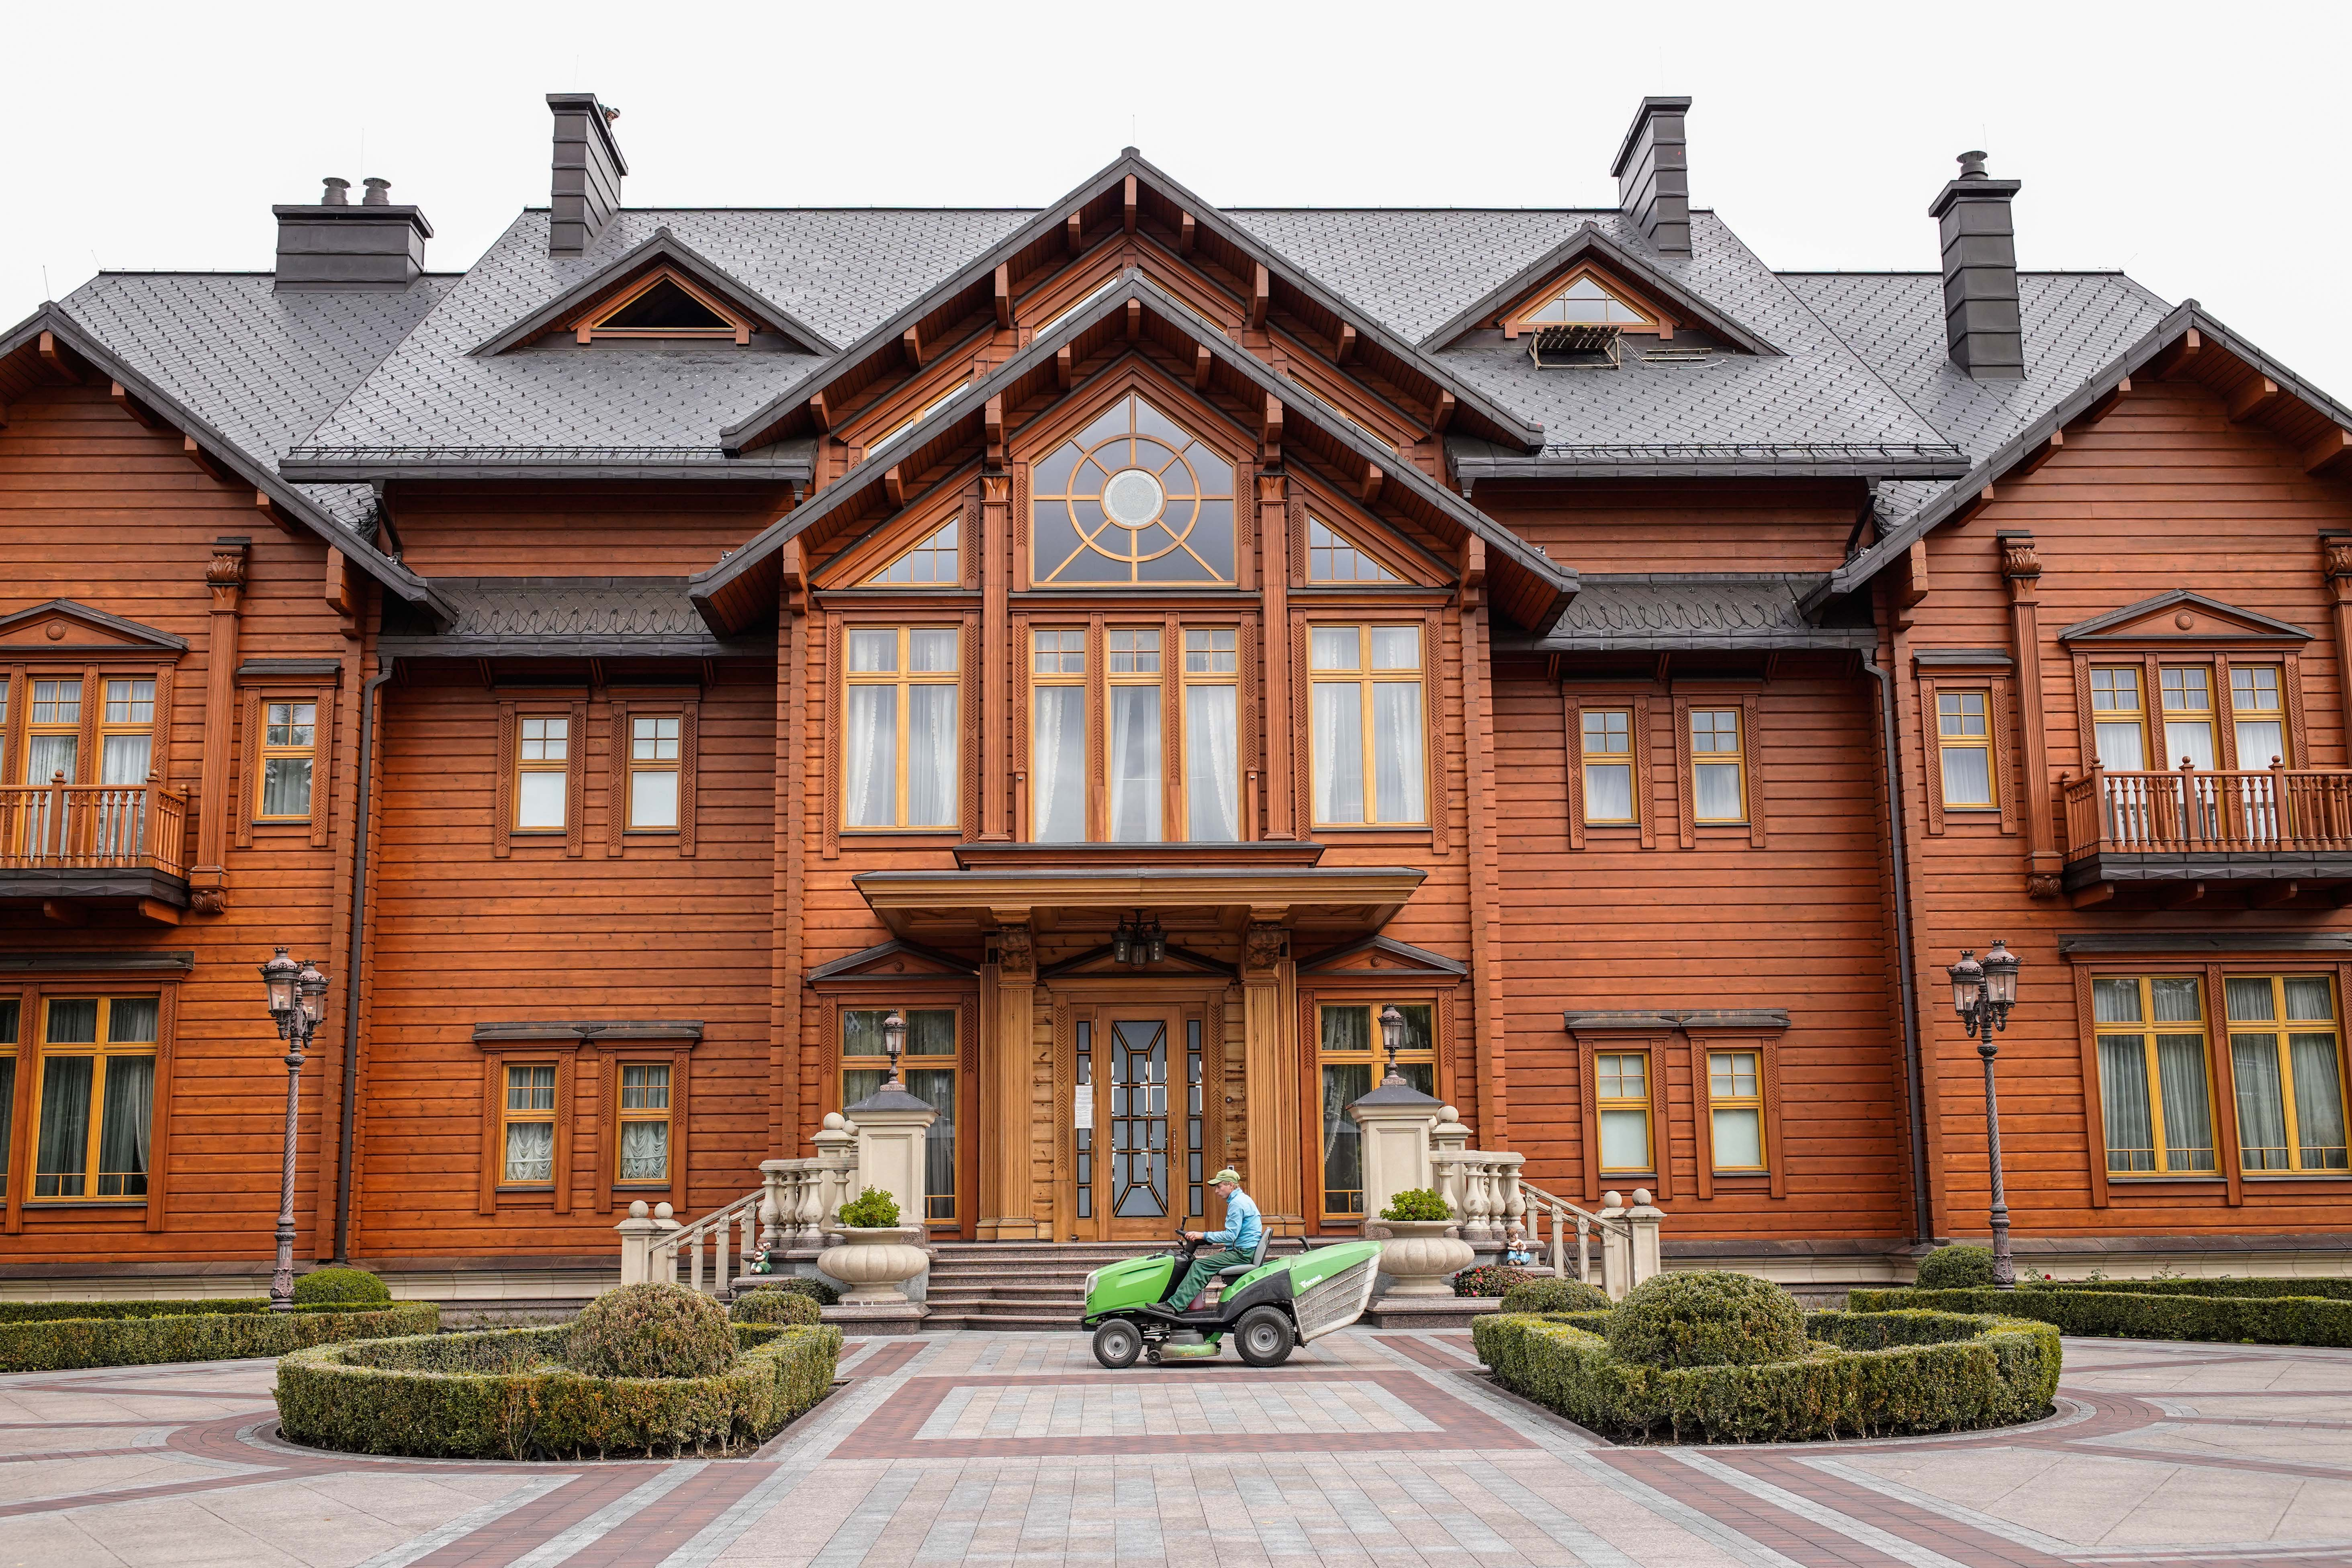 Former Ukrainian President Viktor Yanukovych's estate outside Kyiv is now a museum of corruption.